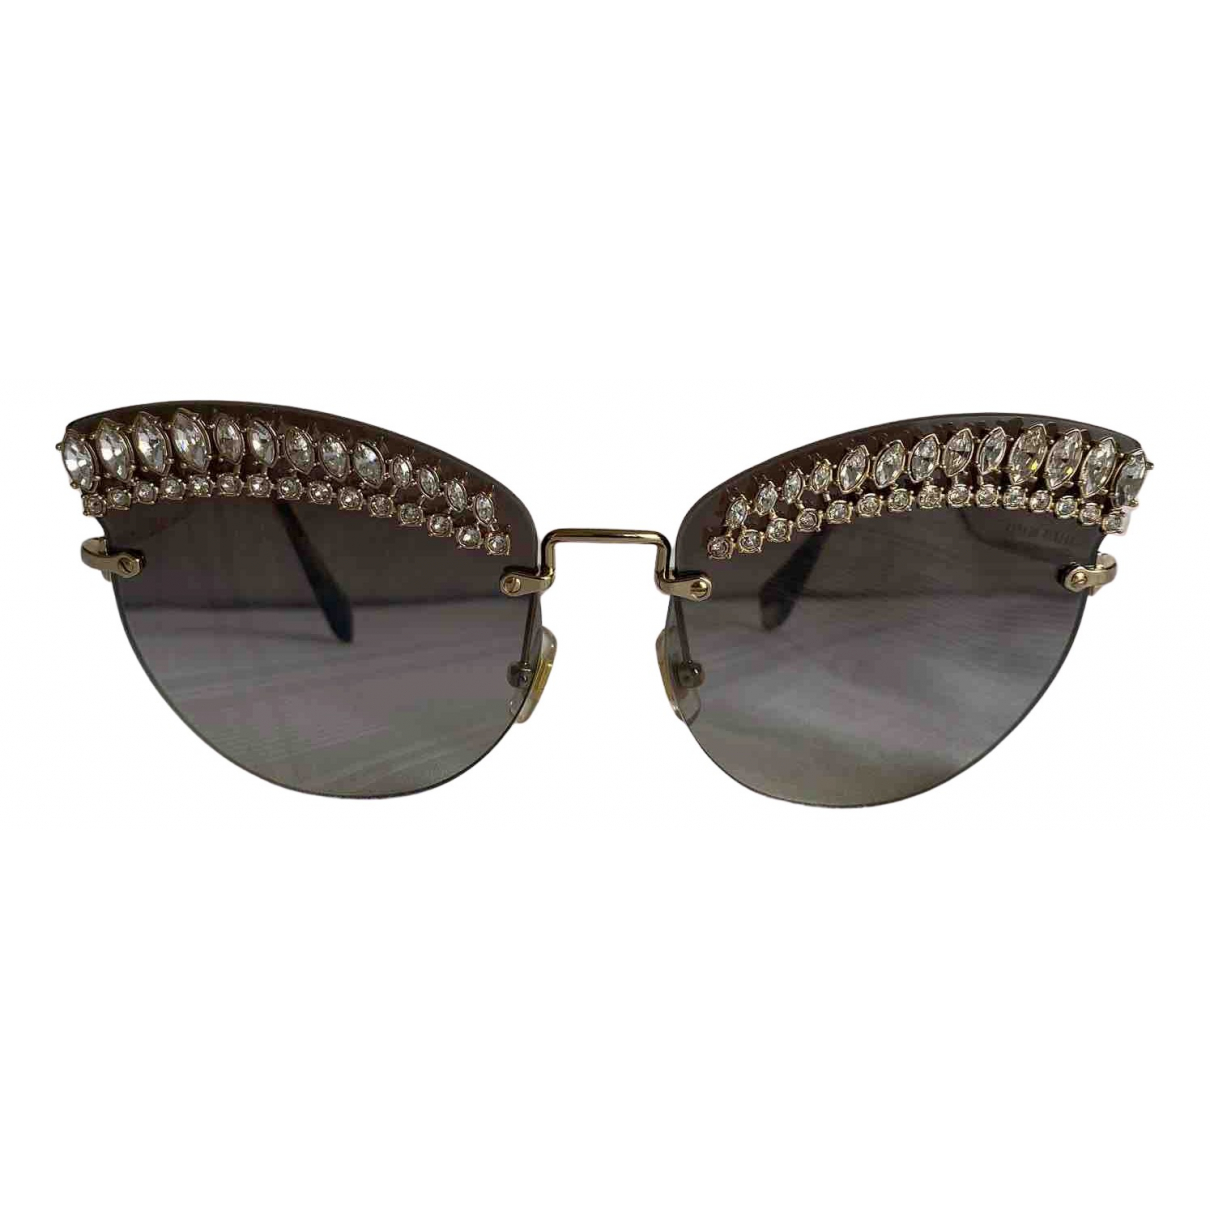 Miu Miu \N Sonnenbrillen in  Silber Metall